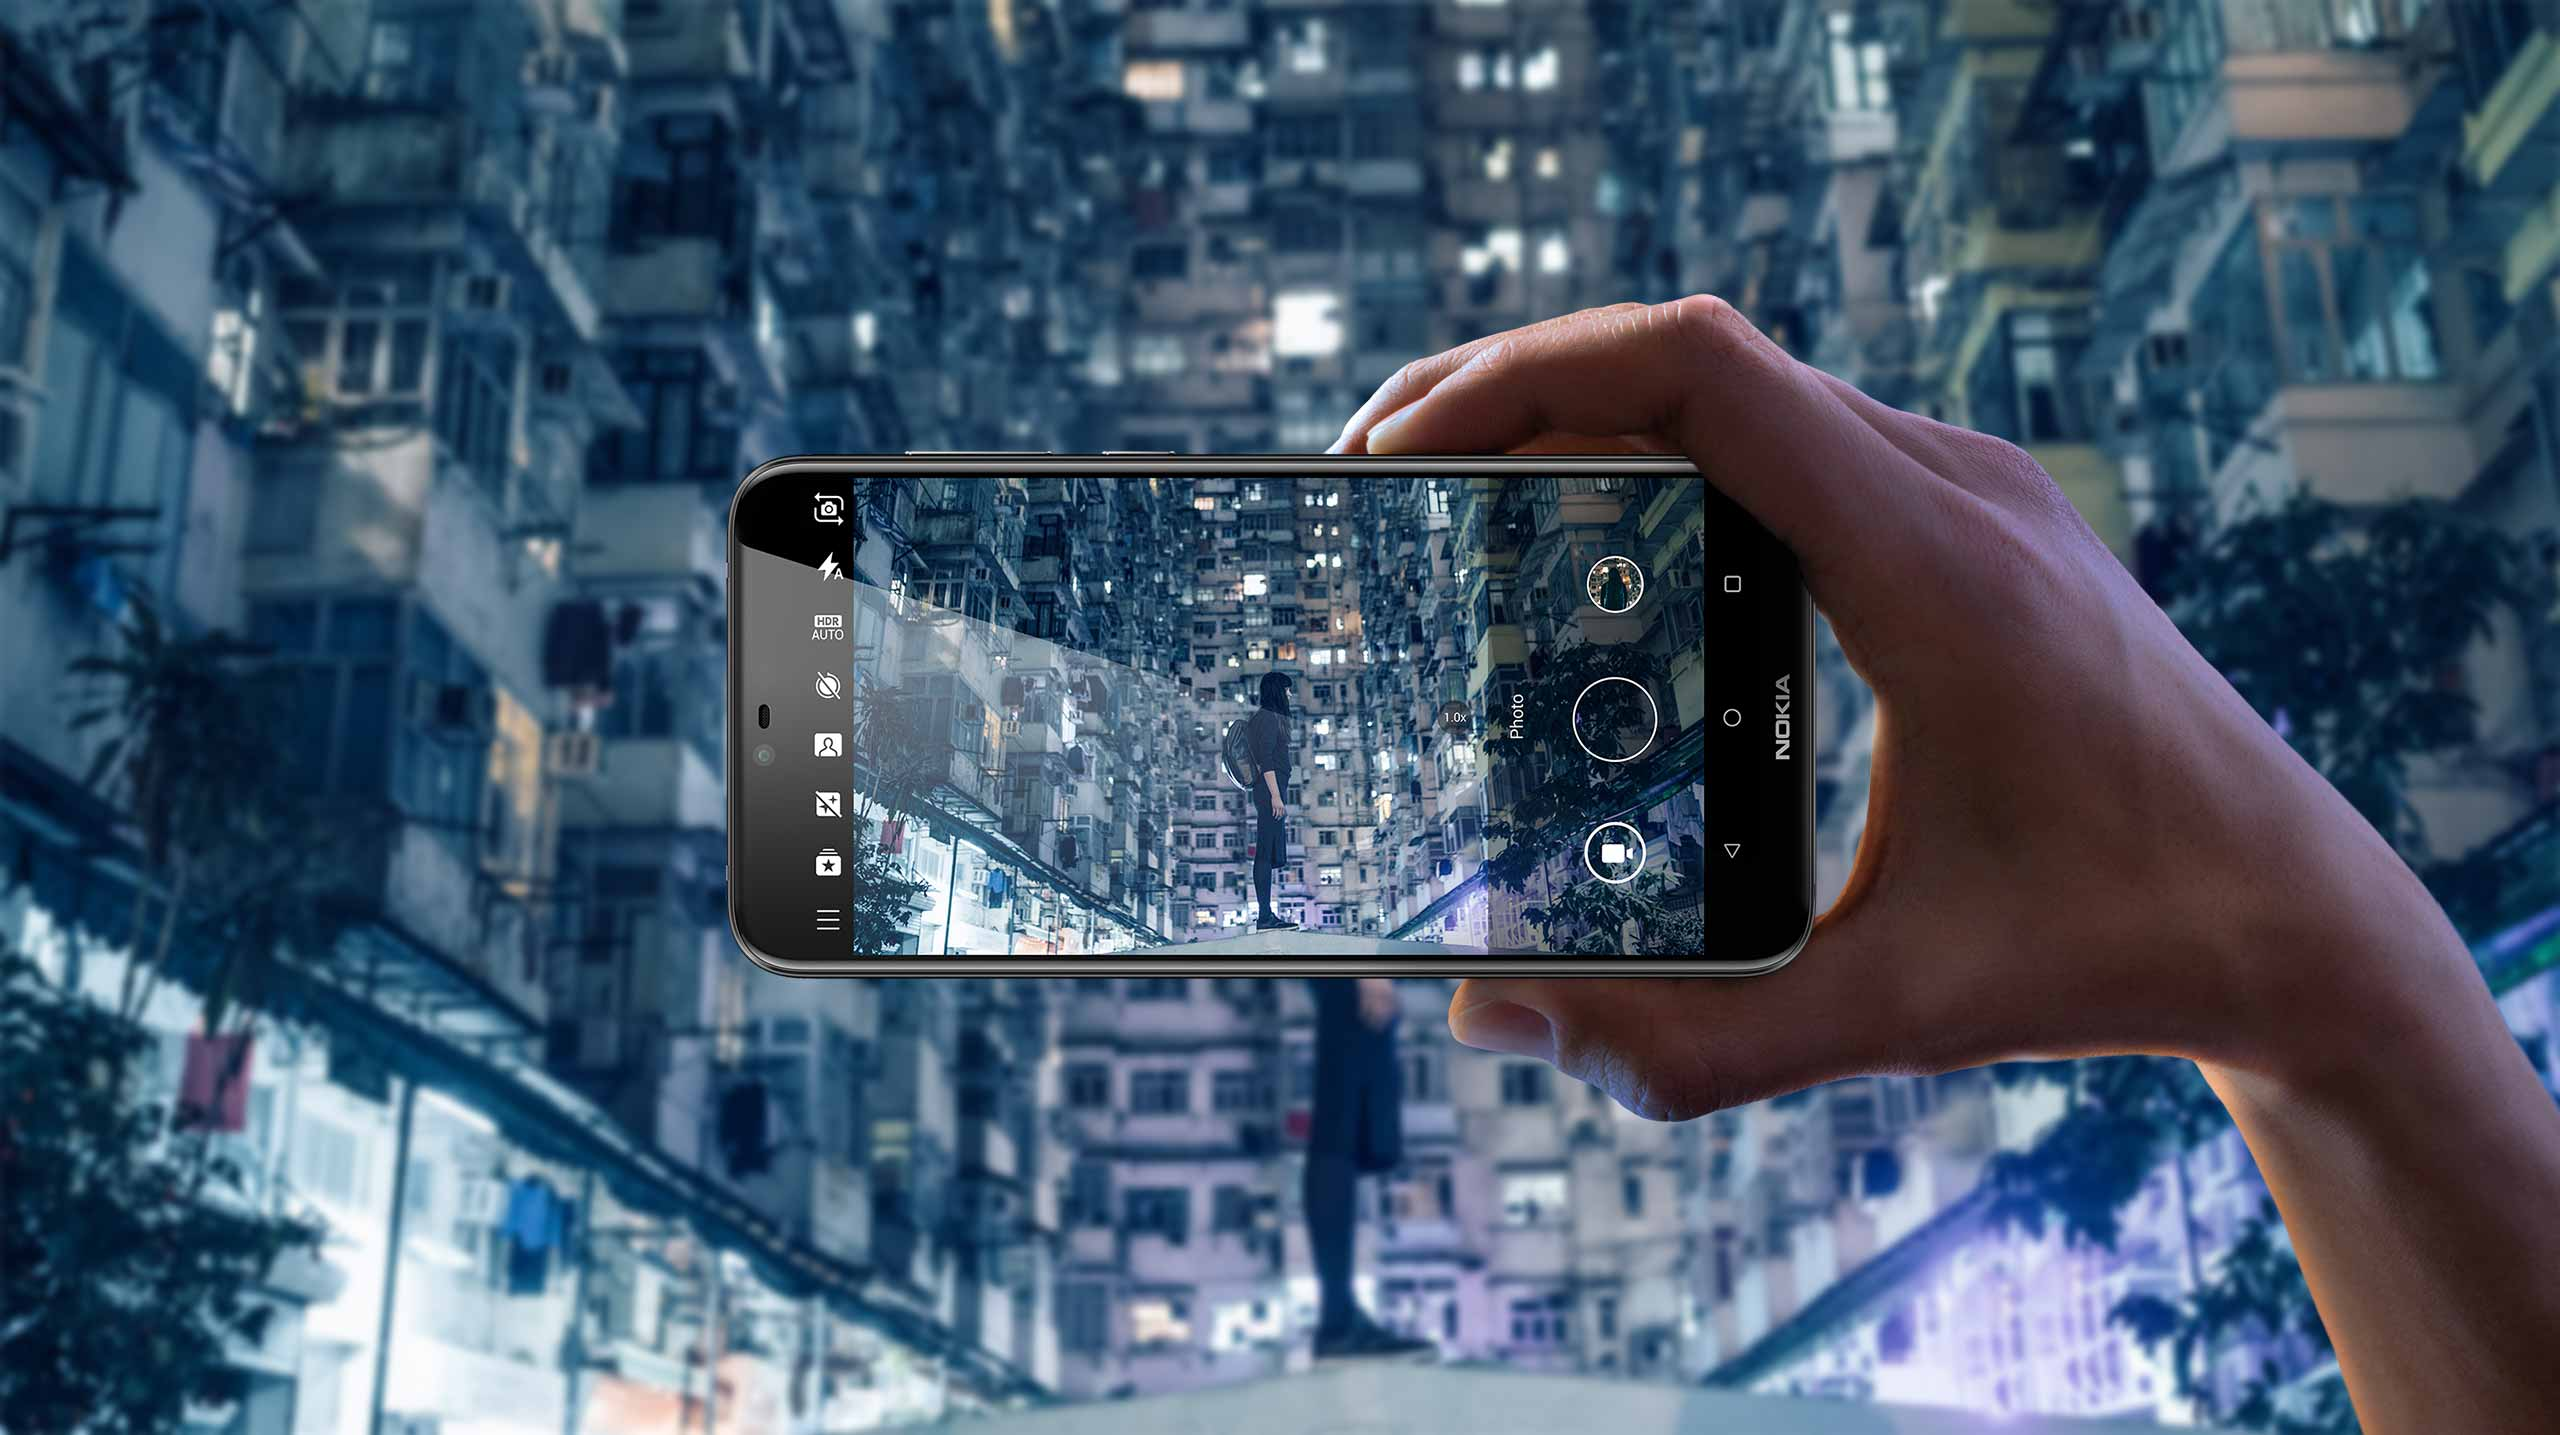 Nokia X6 Camera Specs